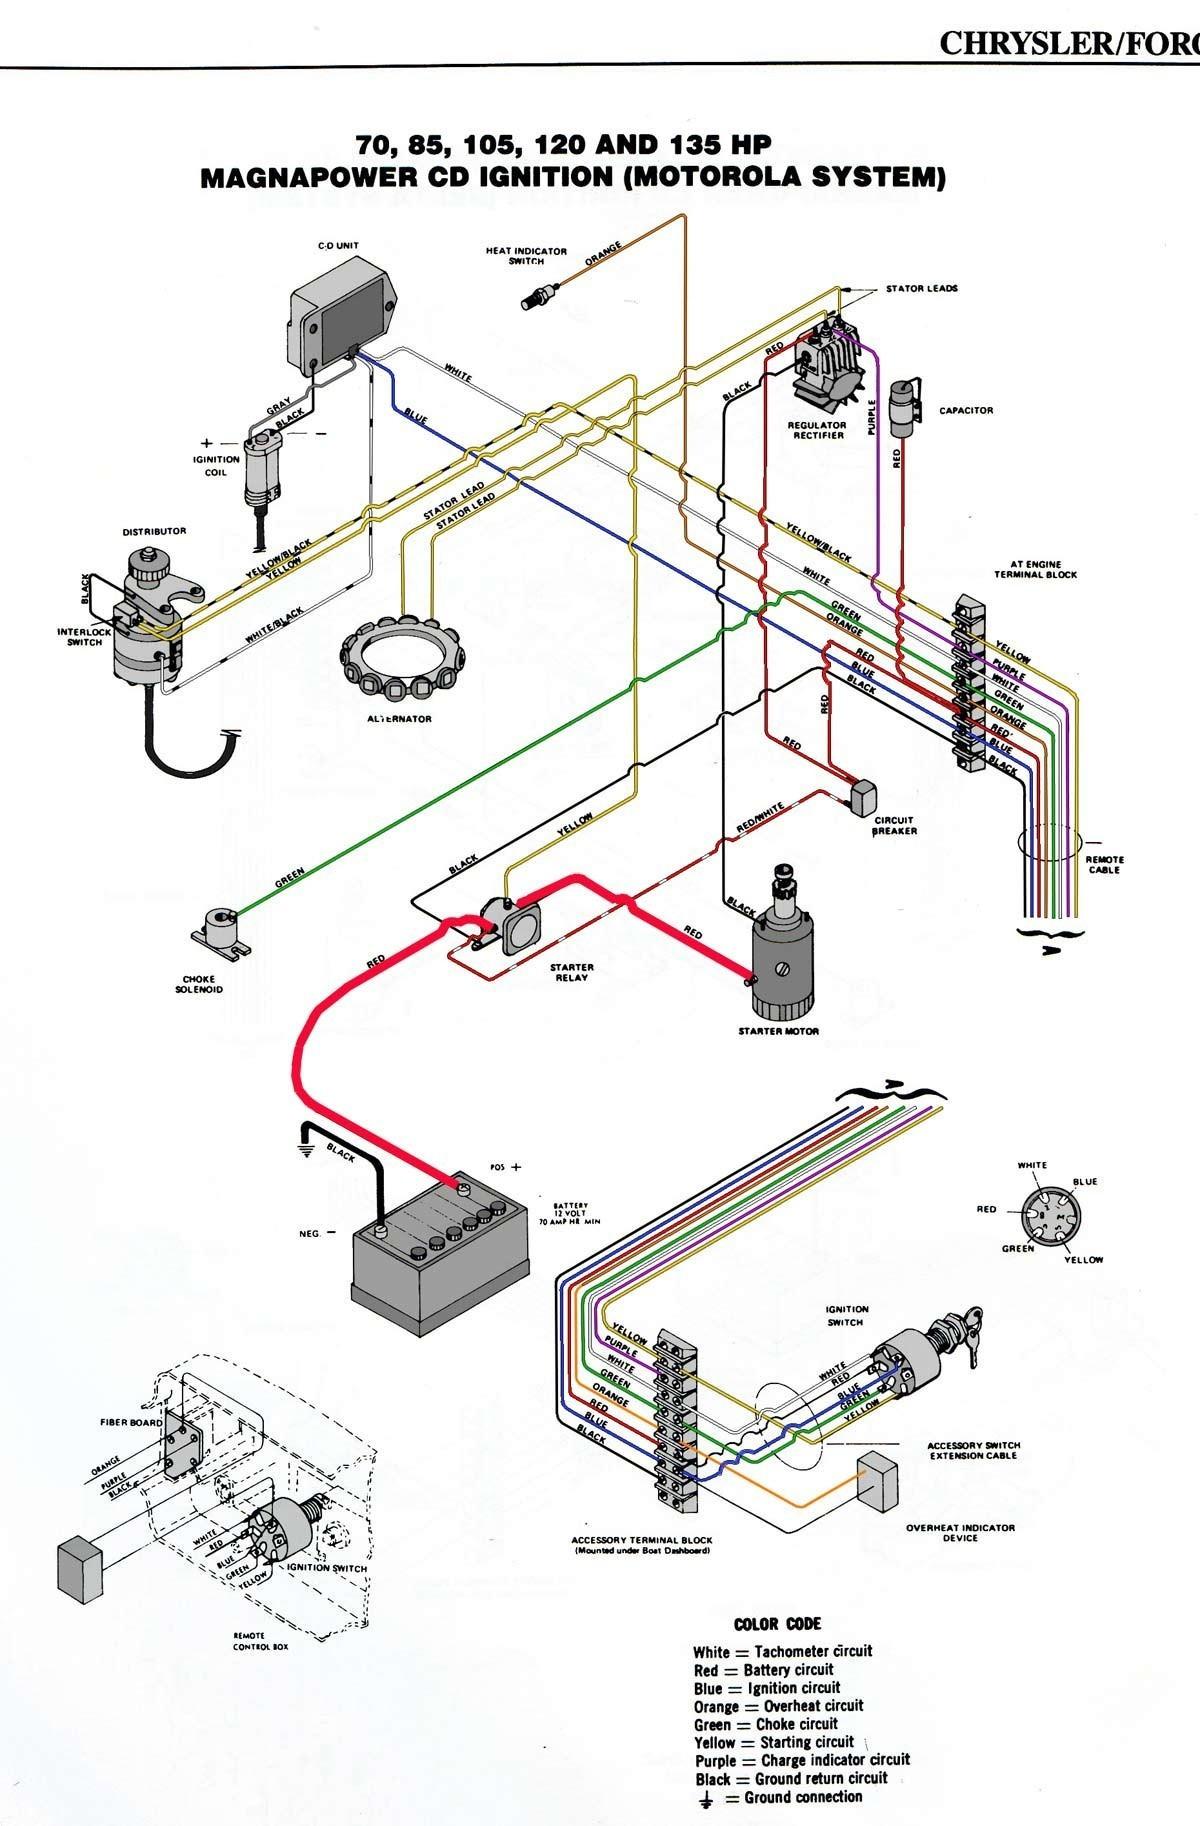 Wiring Diagram Motorola Alternator Fresh Mercury Outboard Alternator Wiring • Free Wiring Diagrams